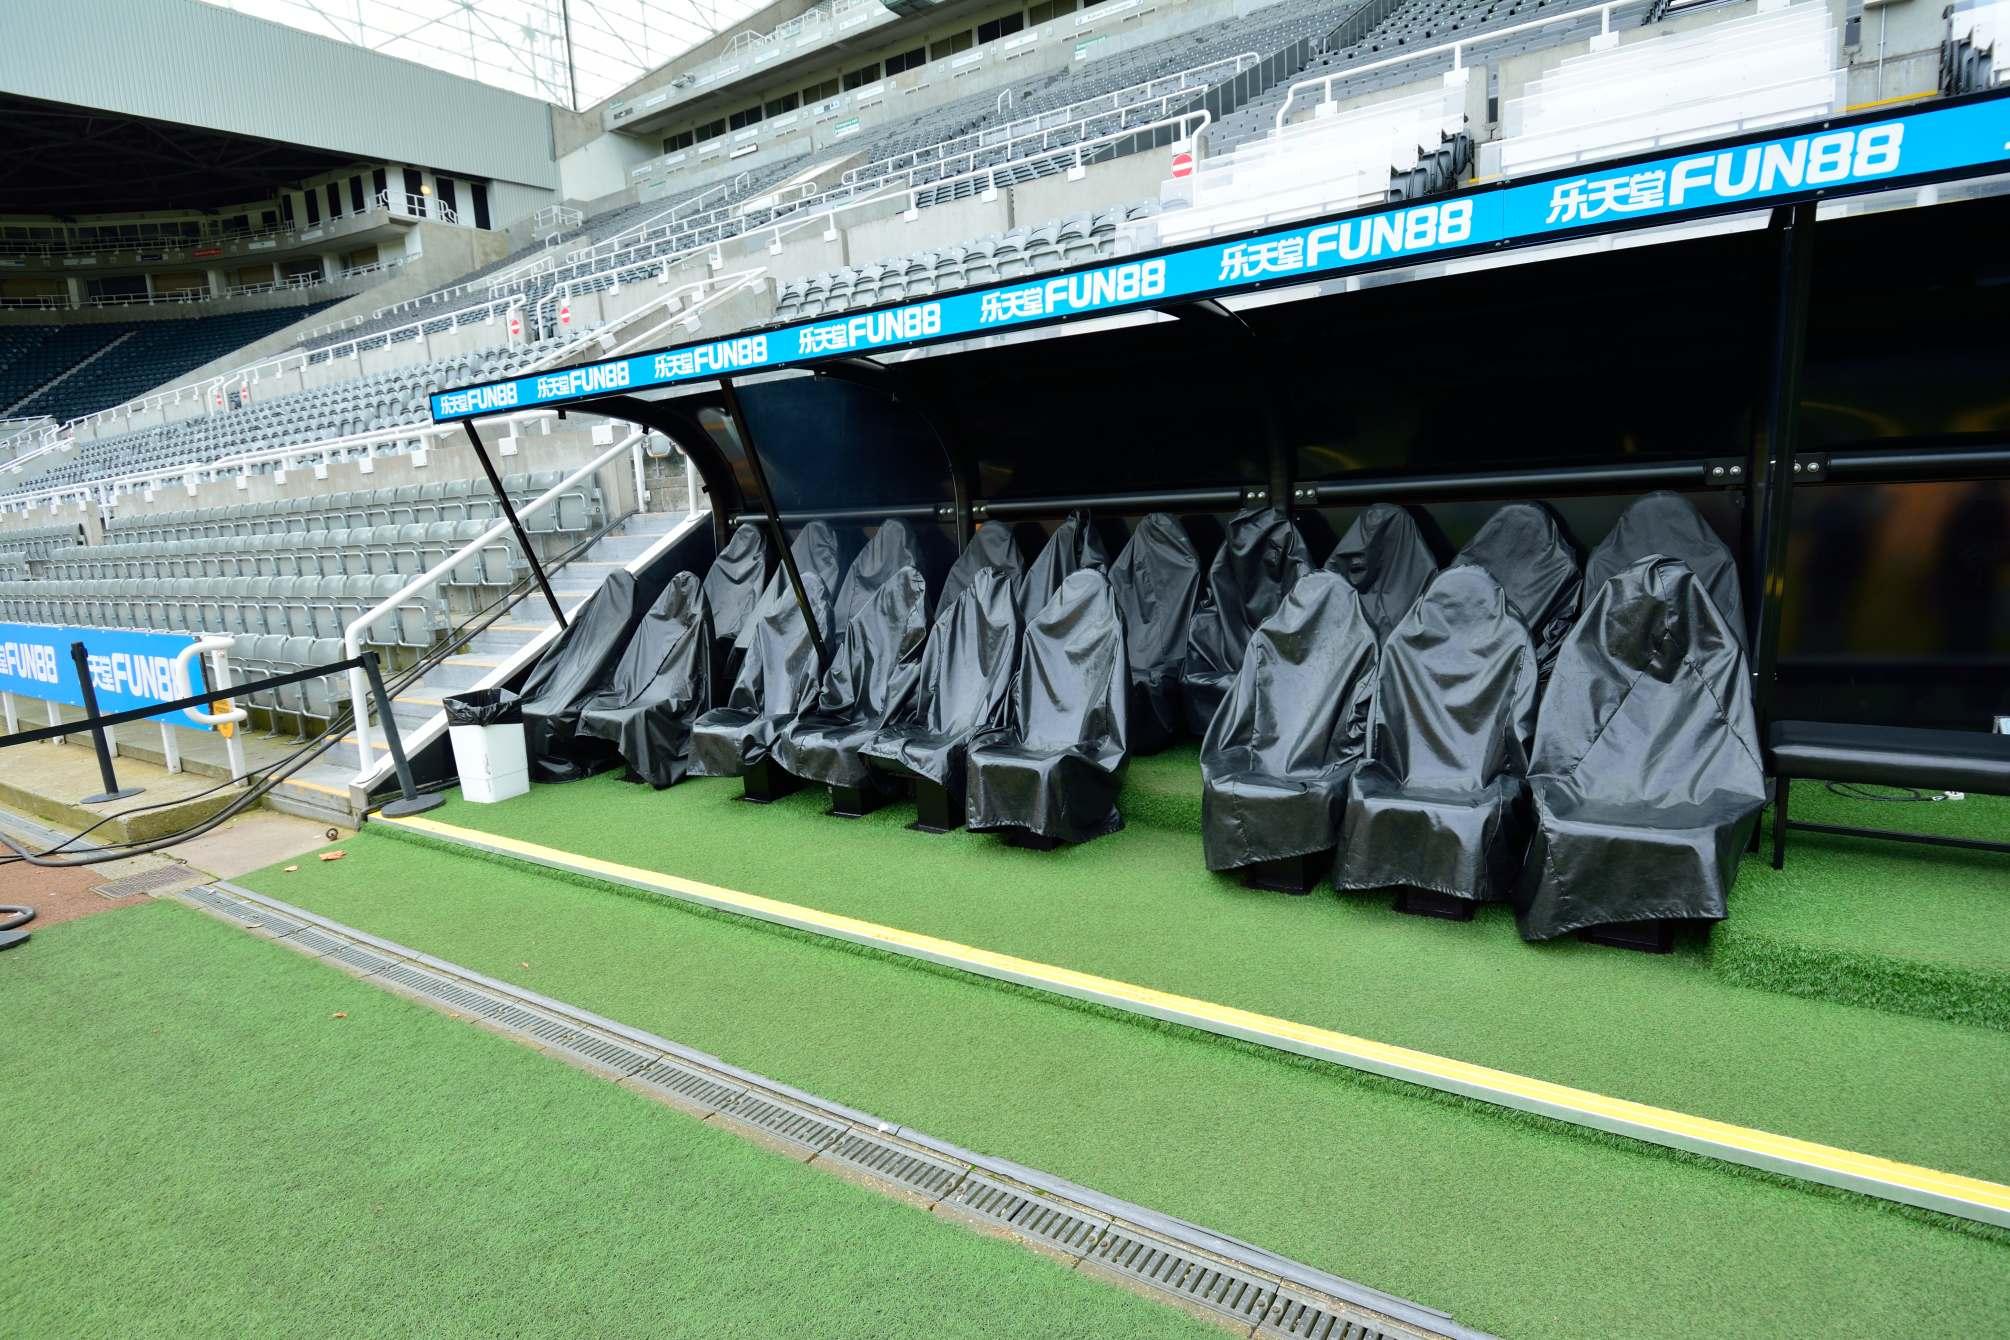 nufc tours5 Newcastle United Stadium Tours for Fans